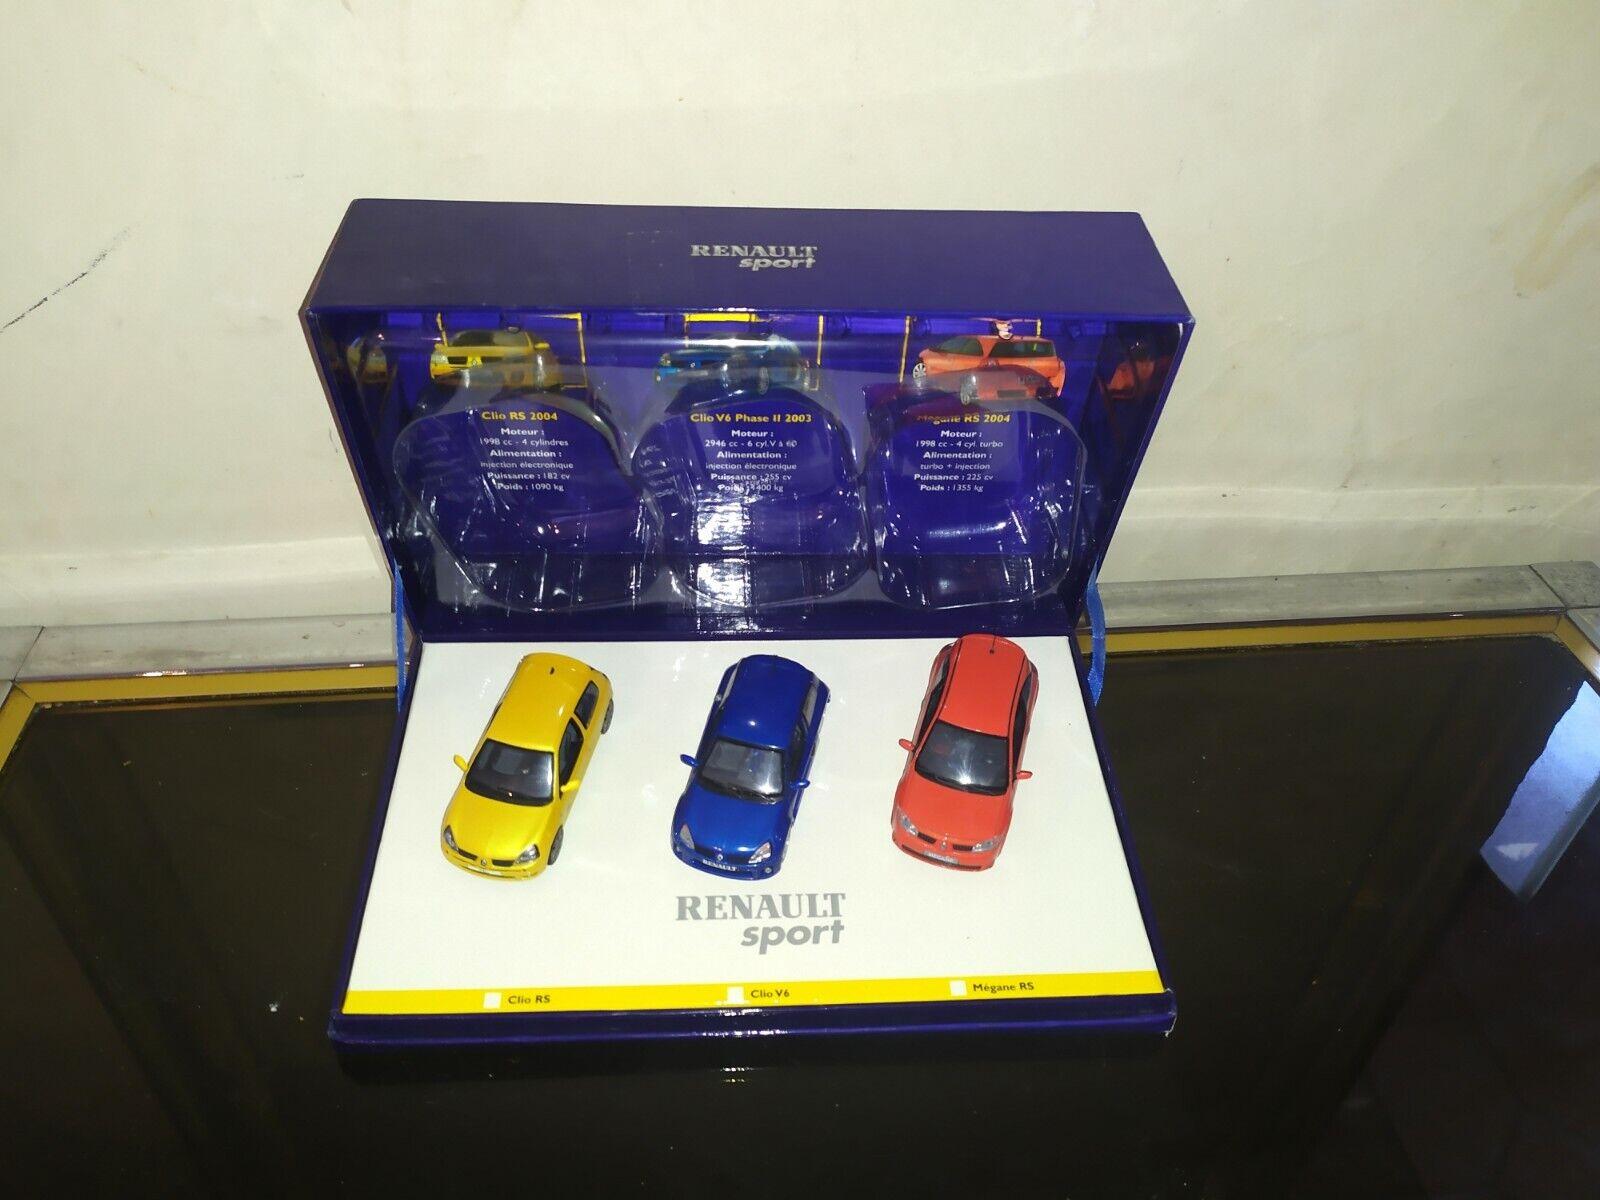 COFFRET RENAULT SPORT RENAULT CLIO RS   V6 PHASE 2  MEGANE RS Universal Hobbie